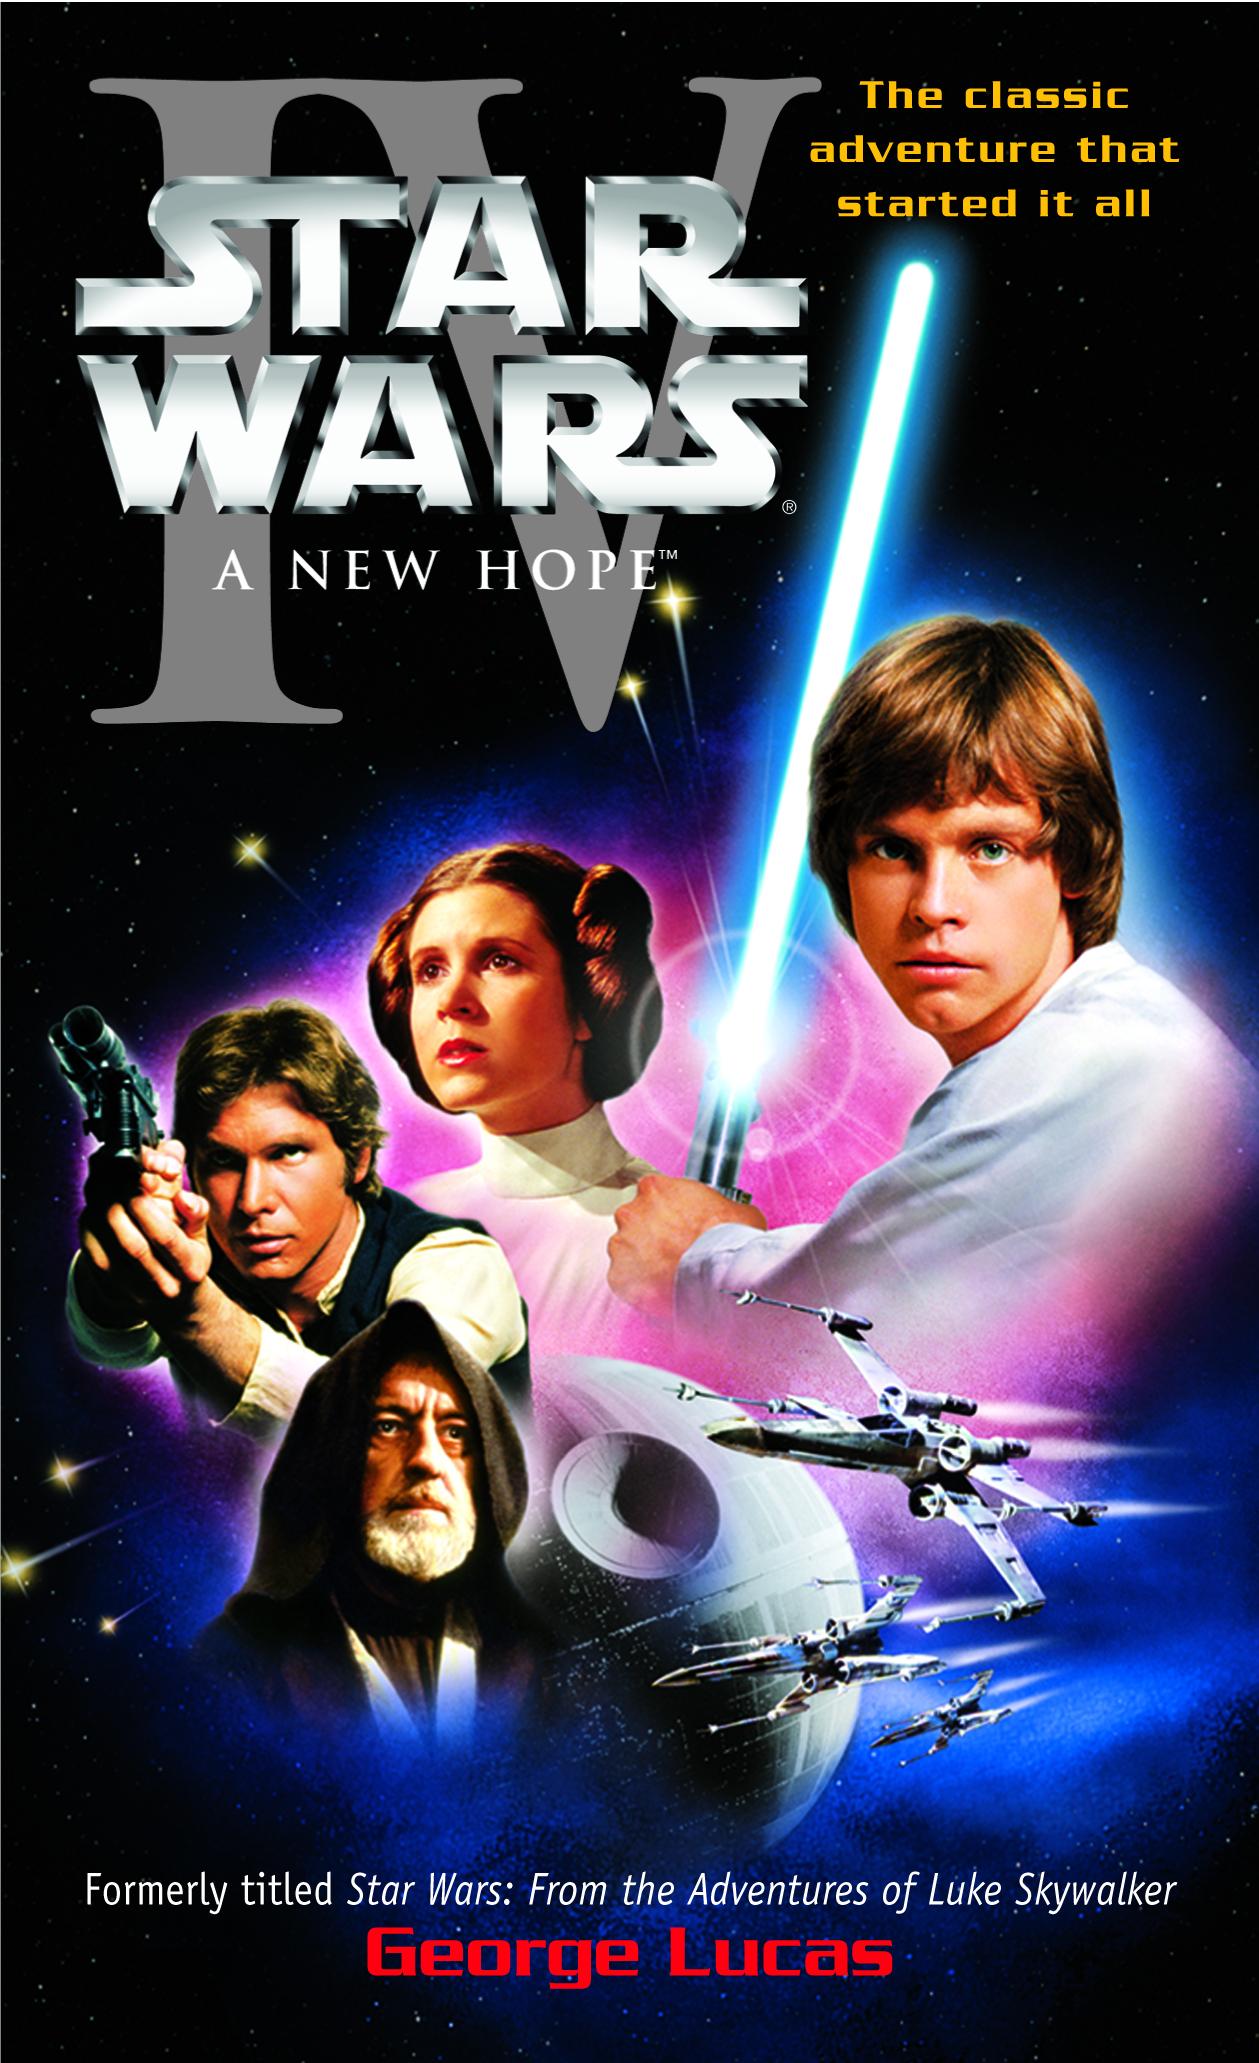 star wars episode 4 full movie free